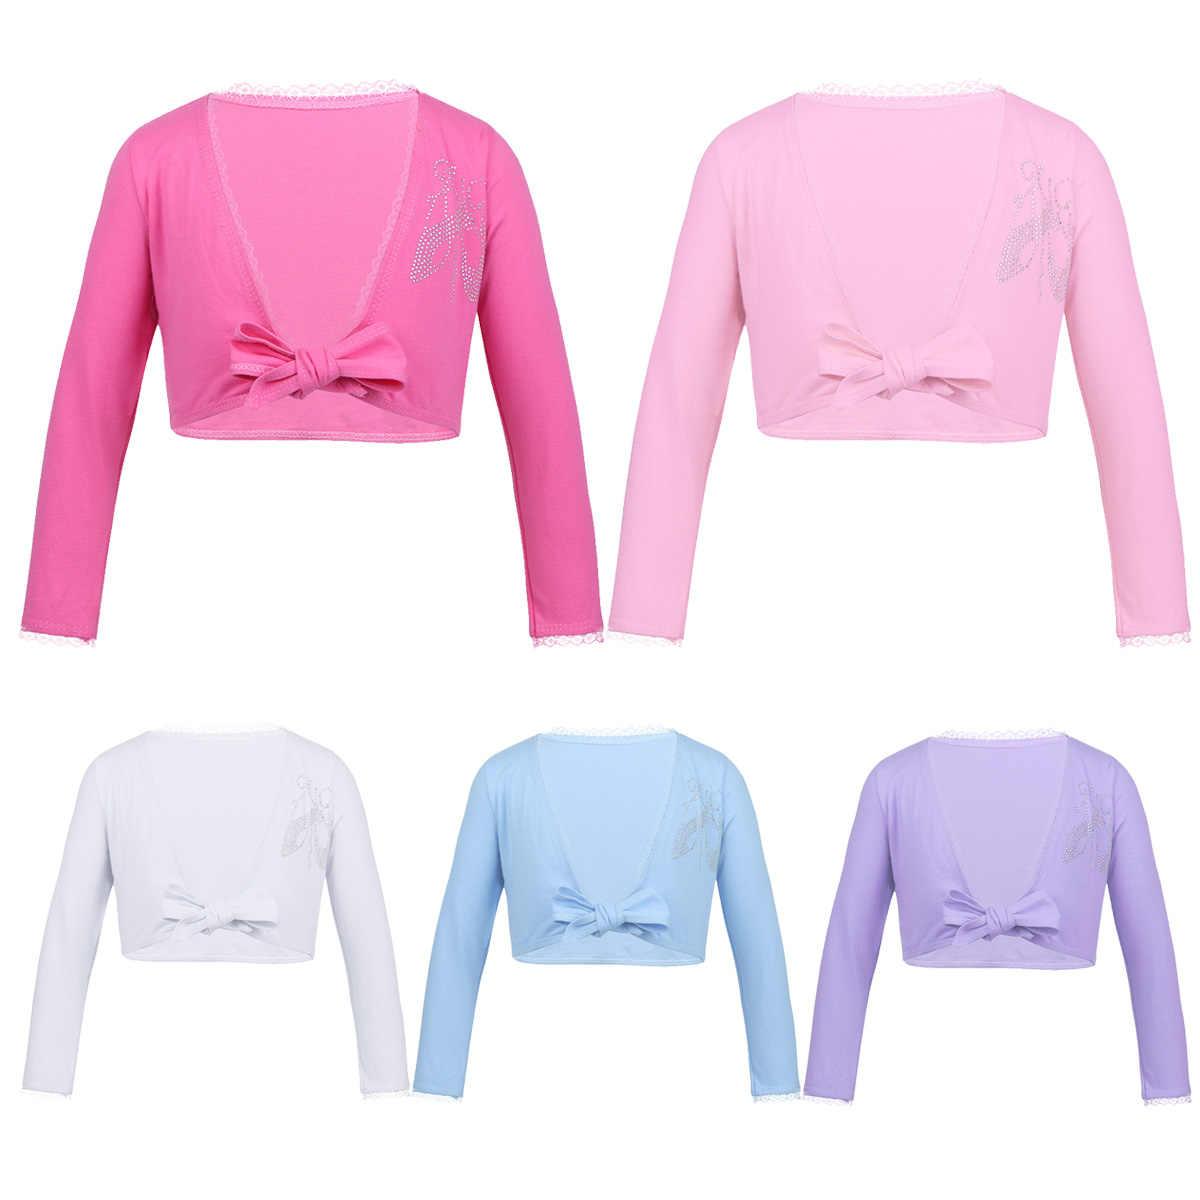 4b5dc3255 Girls Long Sleeve Dance Costume Crop Tops Girl Bow Lace Ballet Leotard  Shrug Wrap Top Cardigan